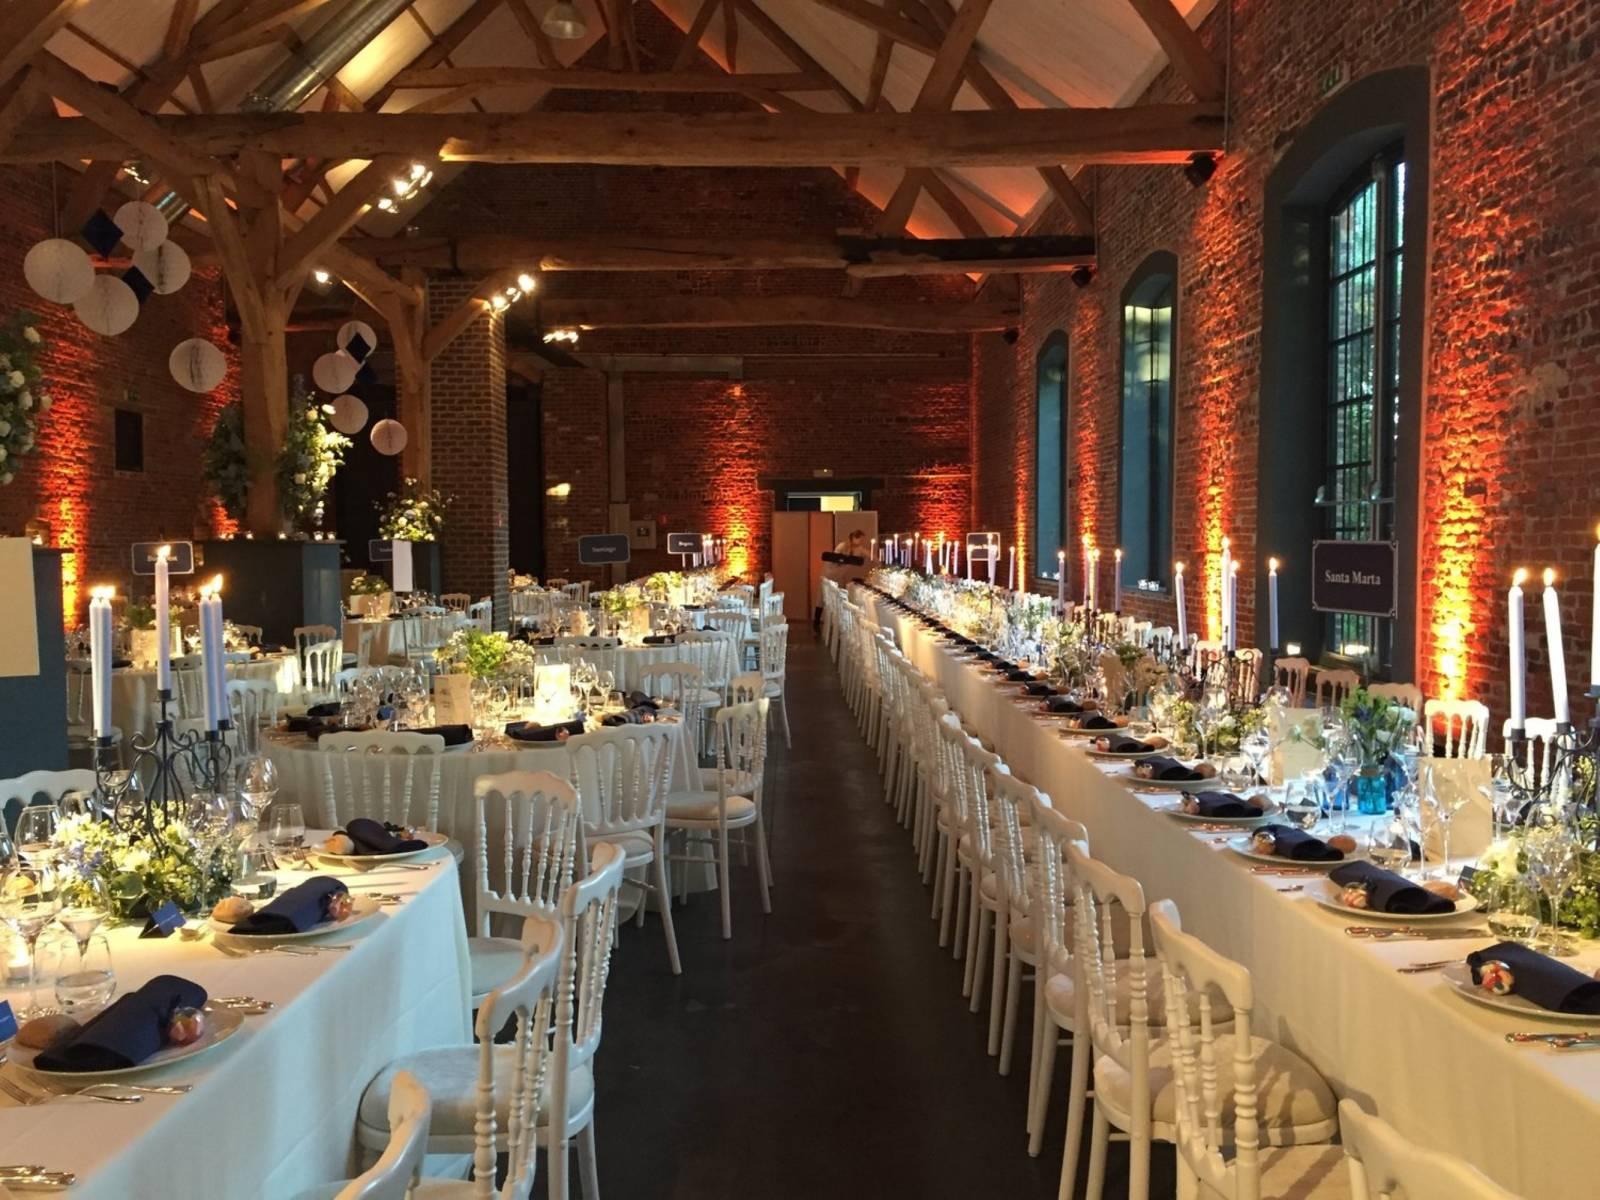 La ferme de Balingue House of Weddings feestzaal salle de fete lieu exceptionnel huwelijk mariage trouwen trouwzaal Brusse (27)